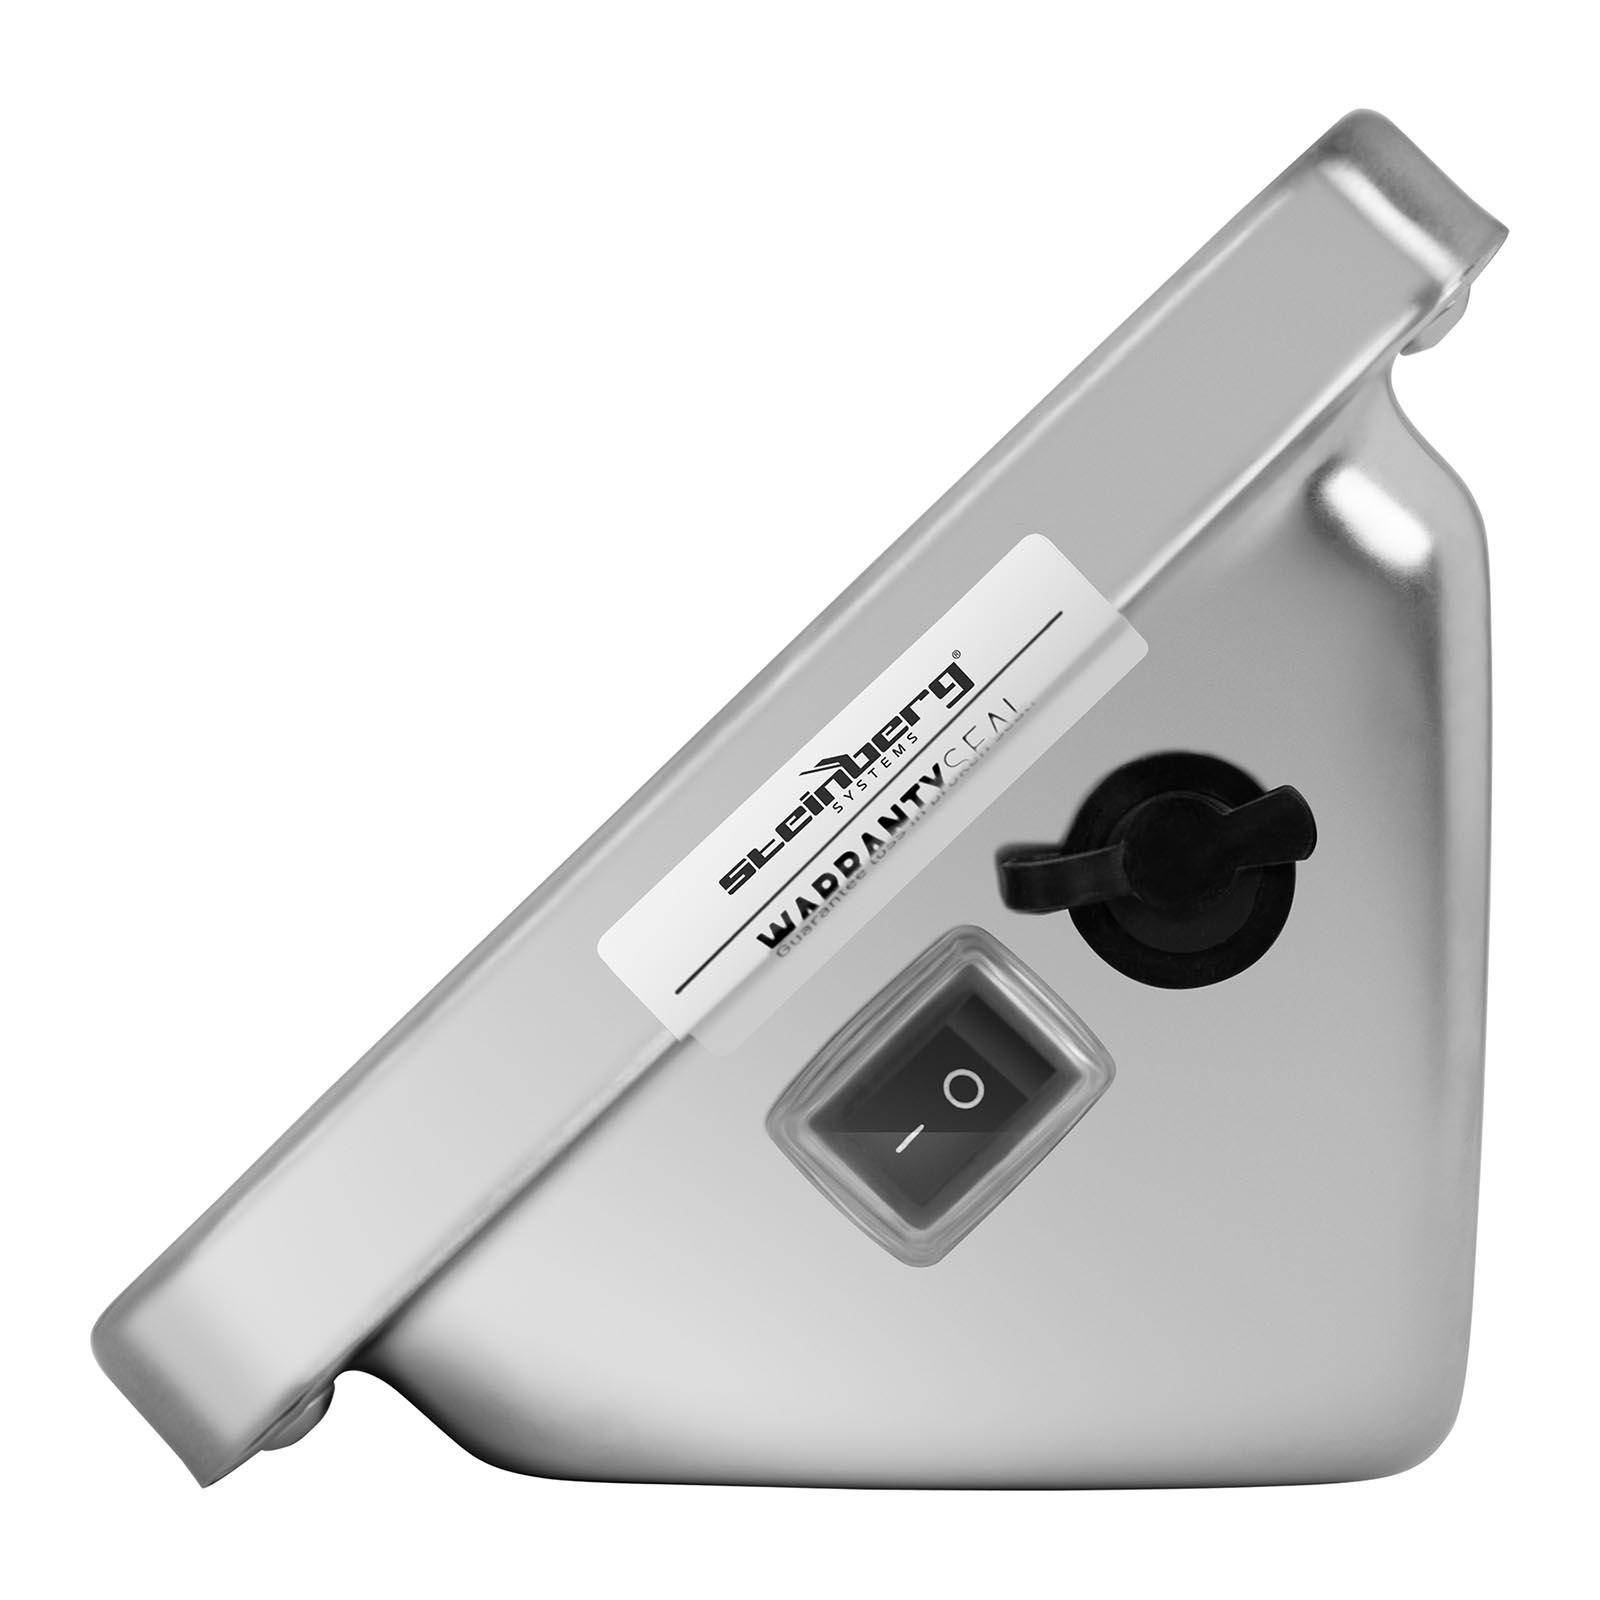 Steinberg Systems Plattformwaage Bodenwaage Industriewaage Digitalwaage Wireless SBS-PF-A150//20 Wireless 150 kg // 20 g, Wiegefl/äche 42 x 52 cm, LCD Display